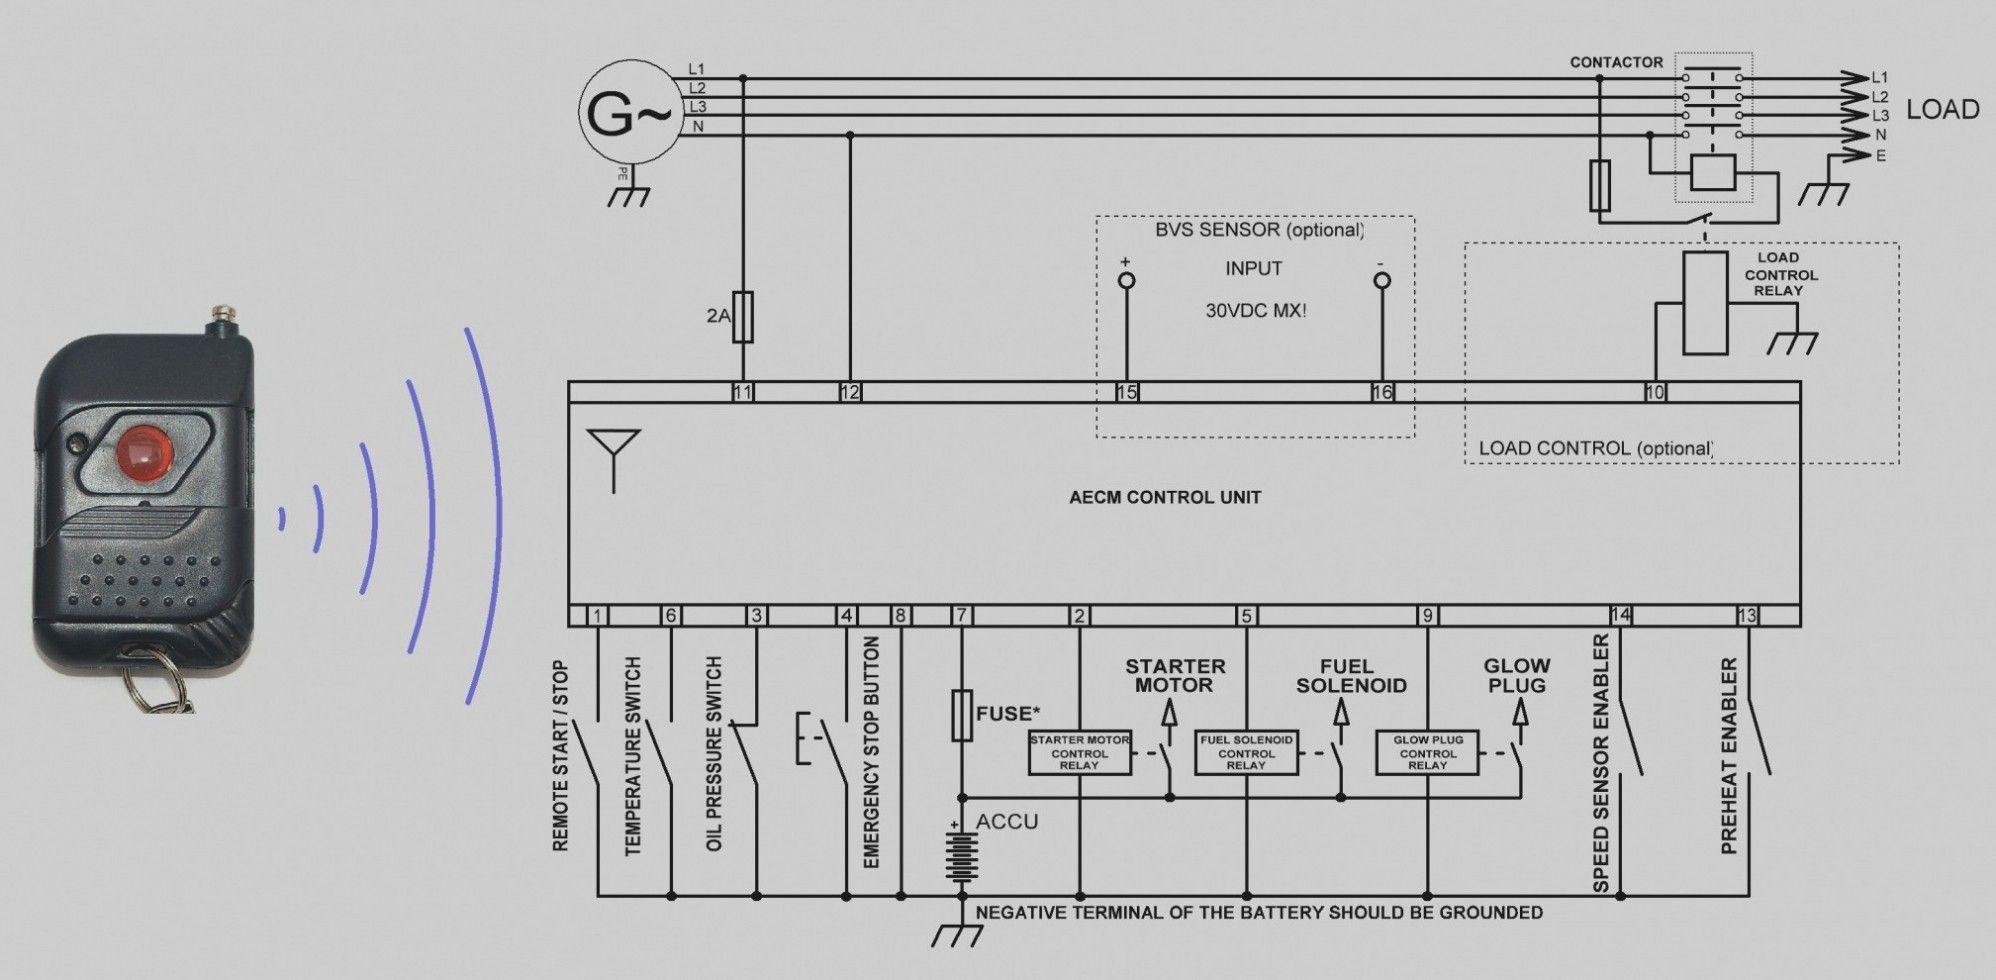 hight resolution of unique electric fan motor wiring diagram pdf diagram diagramsample diagramtemplate wiringdiagram diagramchart worksheet worksheettemplate